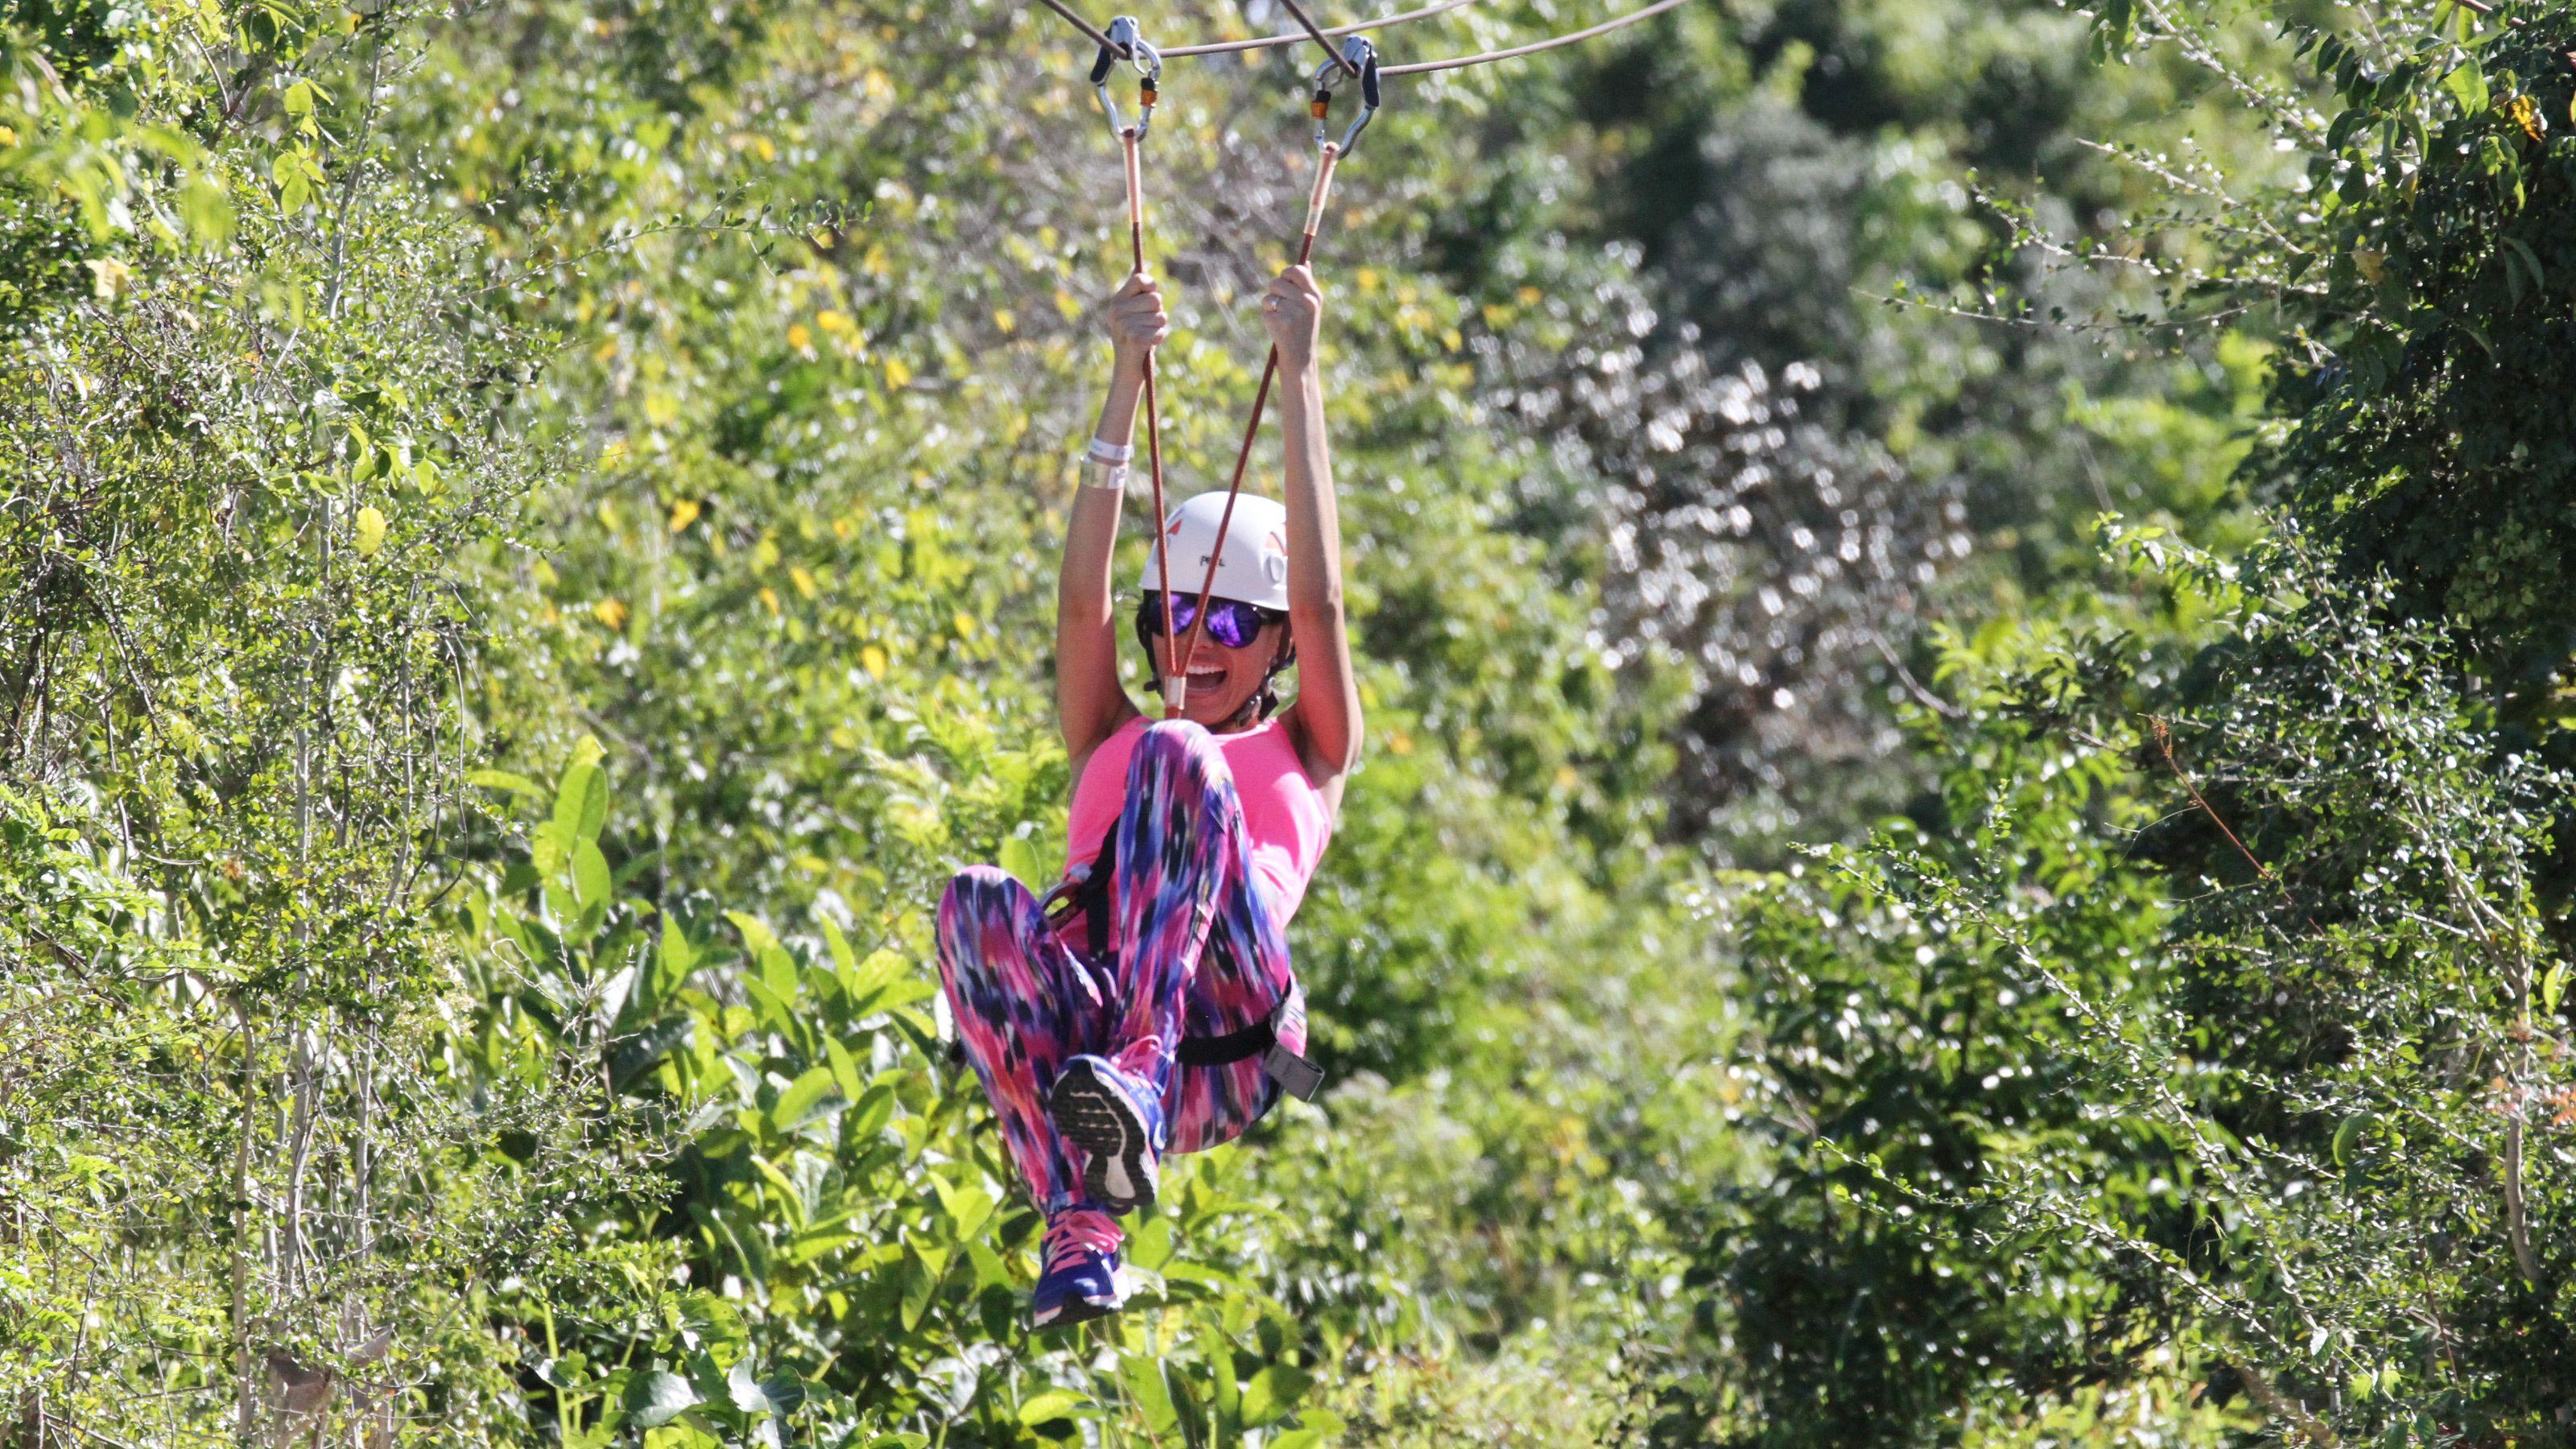 woman zip lines through trees at theme park in Santo Domingo